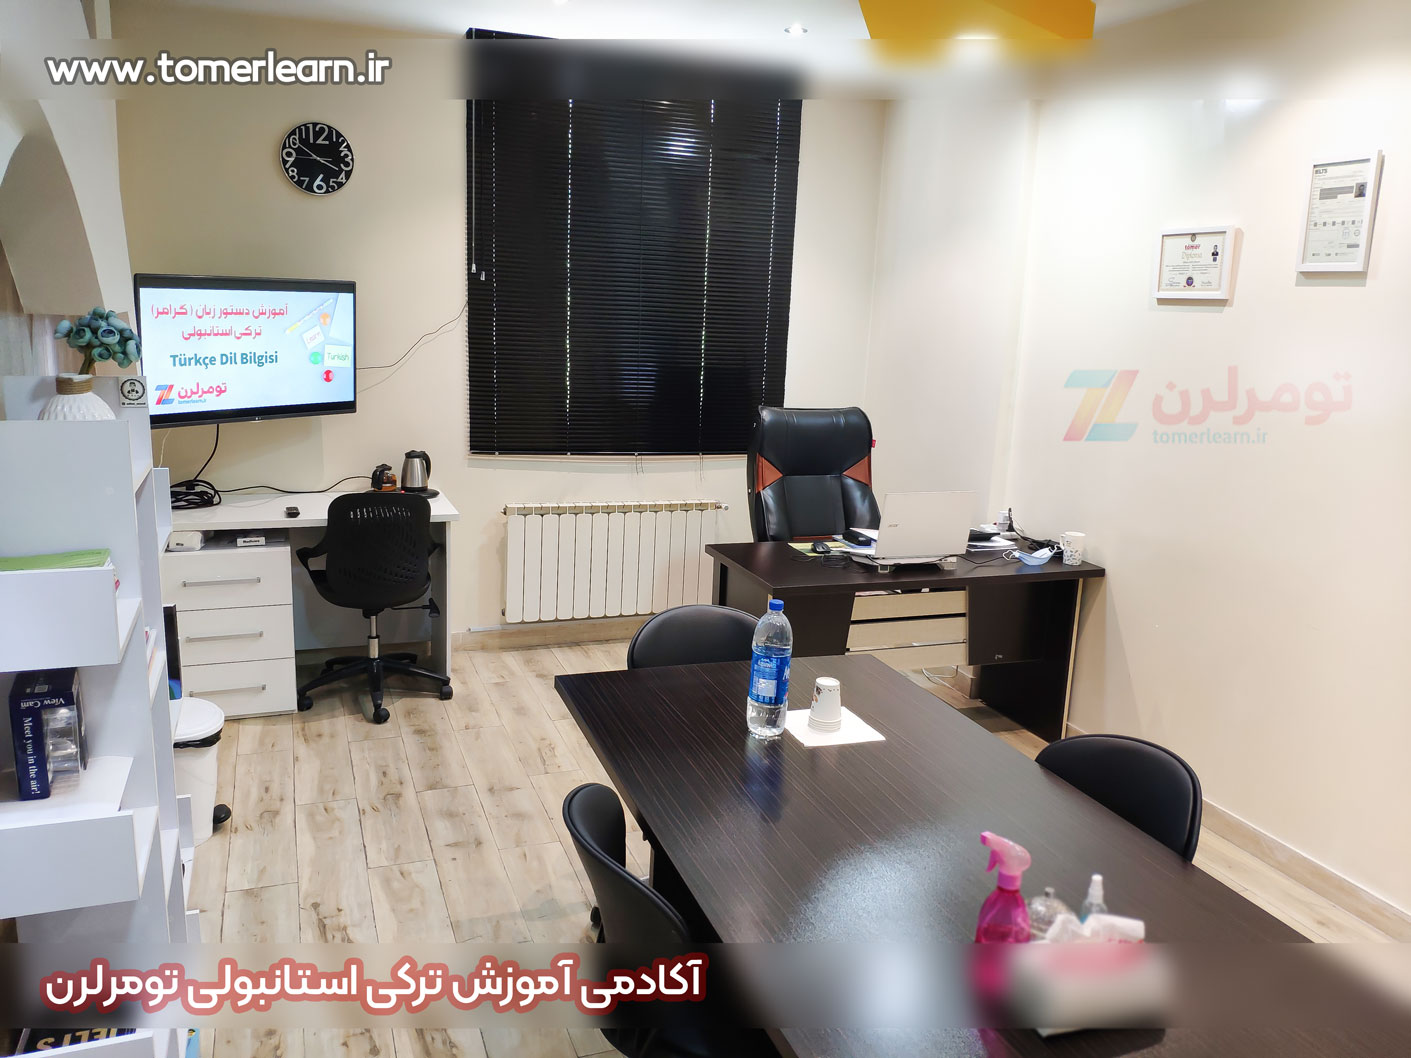 IMG 20210521 155223 - آموزش زبان ترکی استانبولی در تبریز | تومرلرن